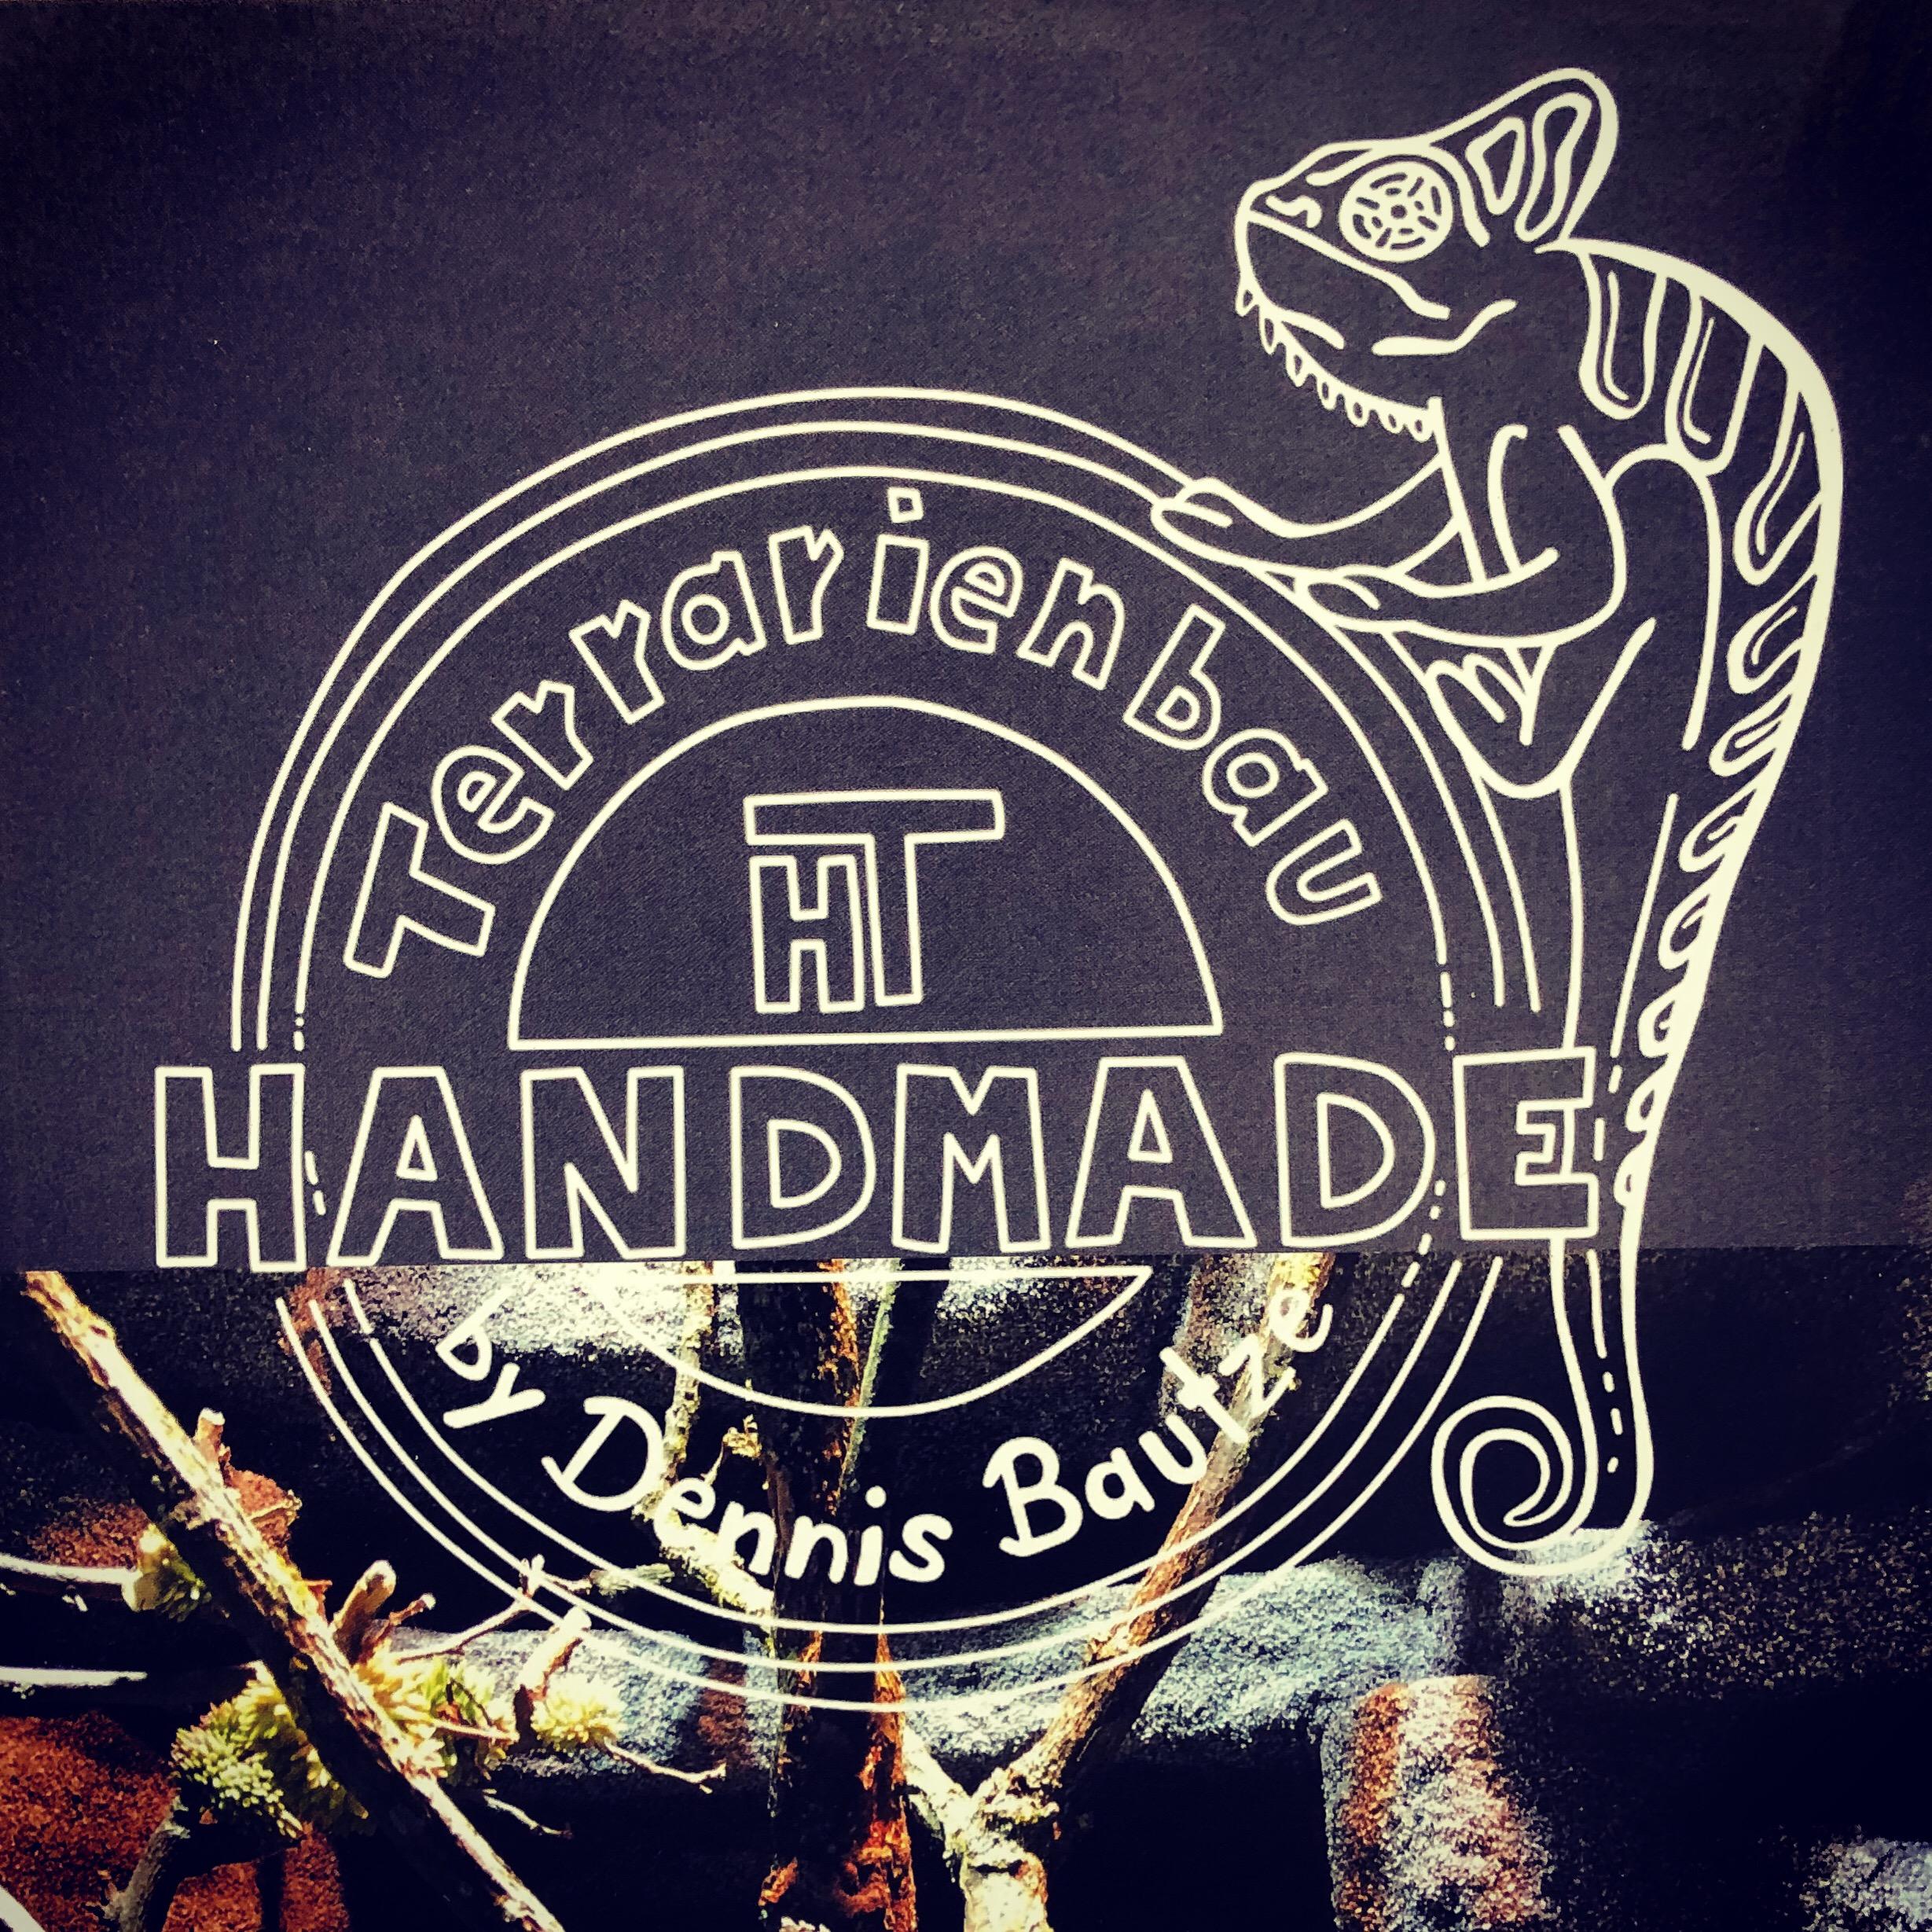 Handmade Terrarienbau